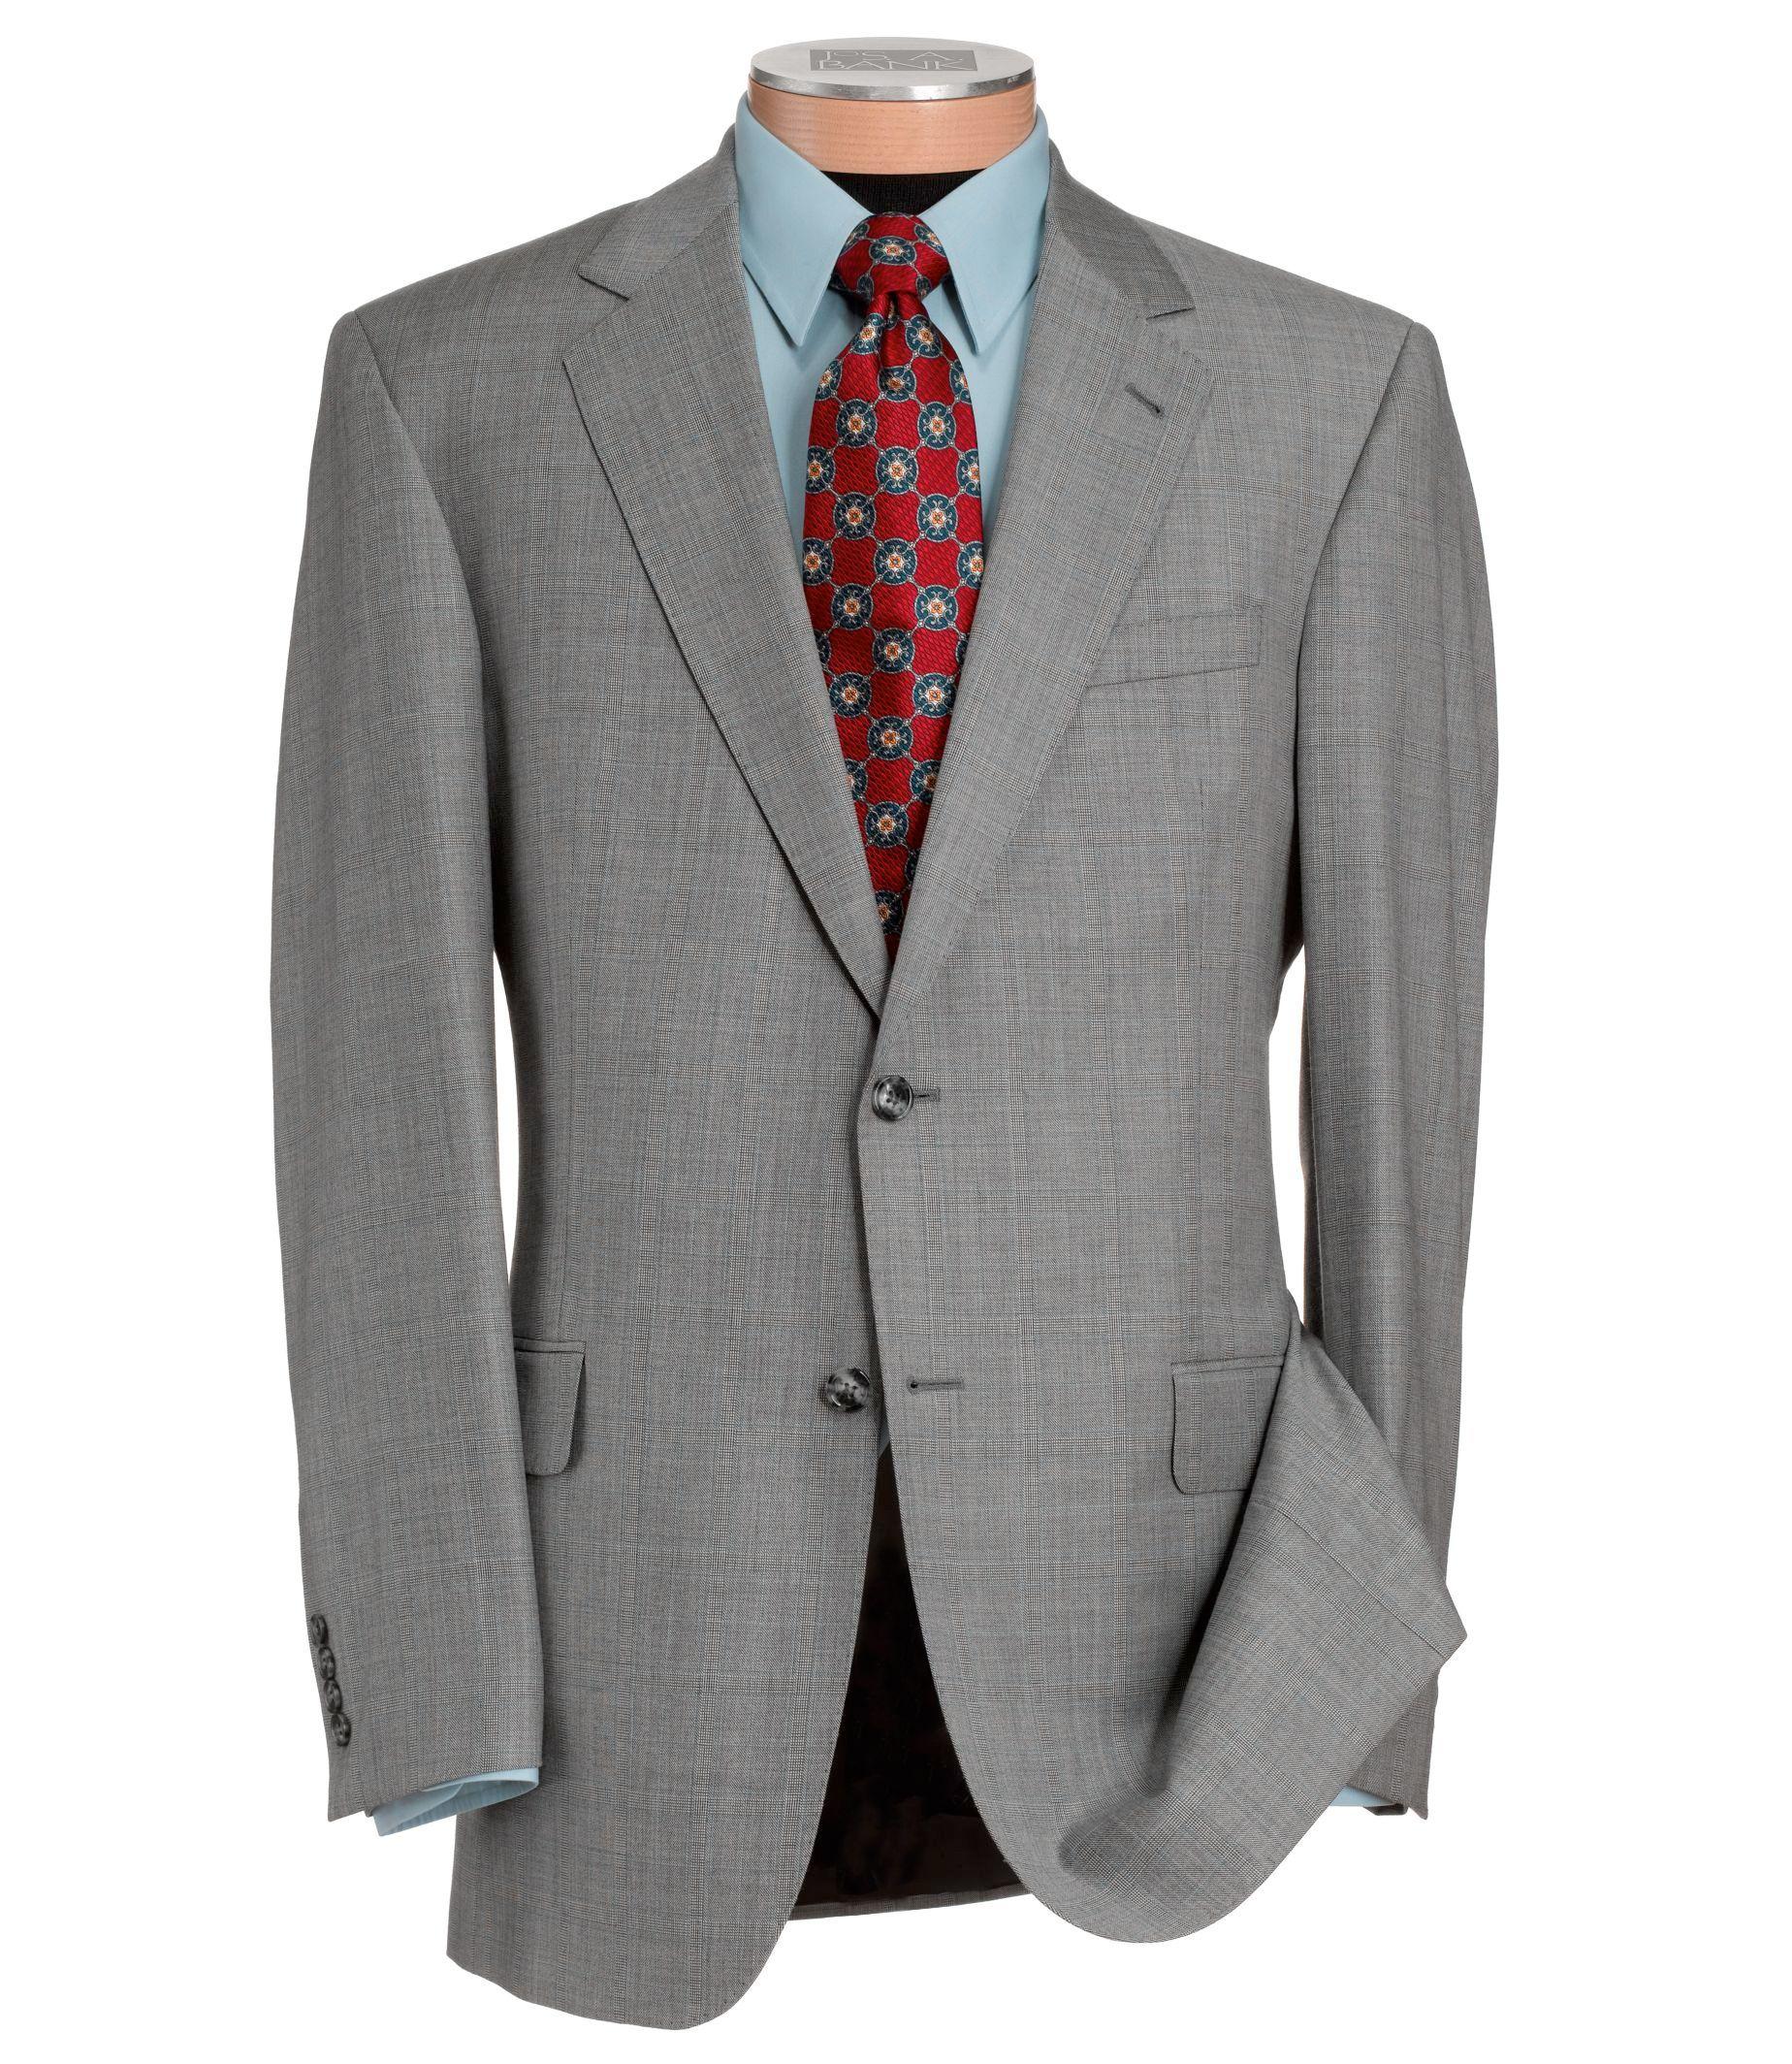 Signature Gold Superfine 2-Button Wool Suit- Black/White Plaid